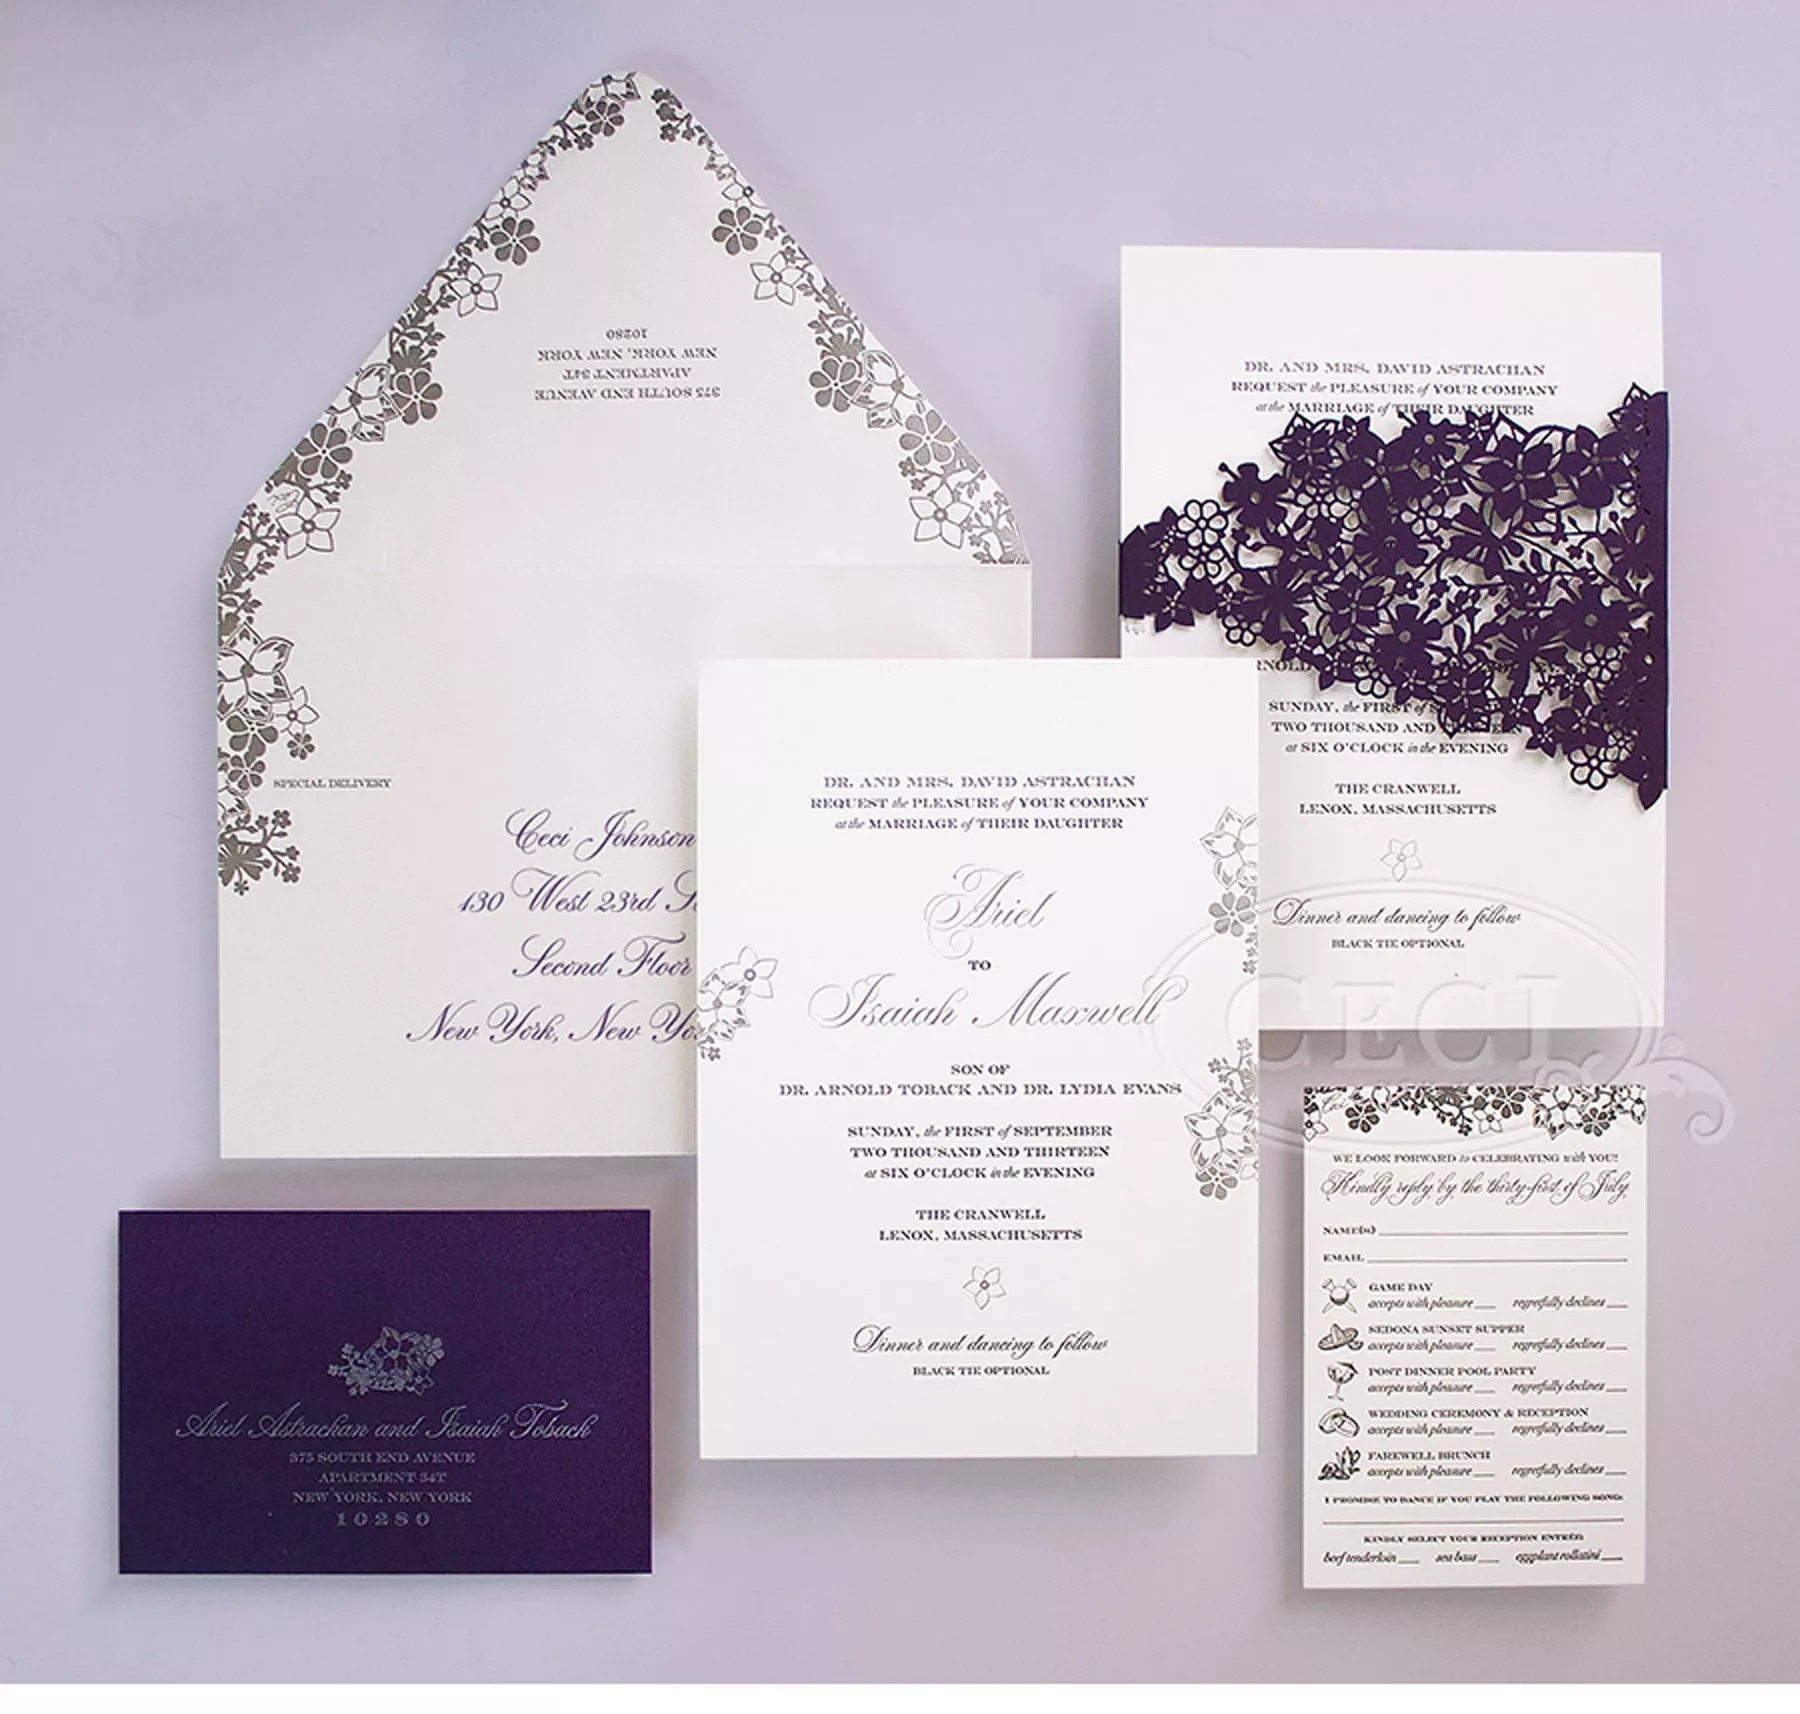 ceci new york new york ny spanish wedding invitations